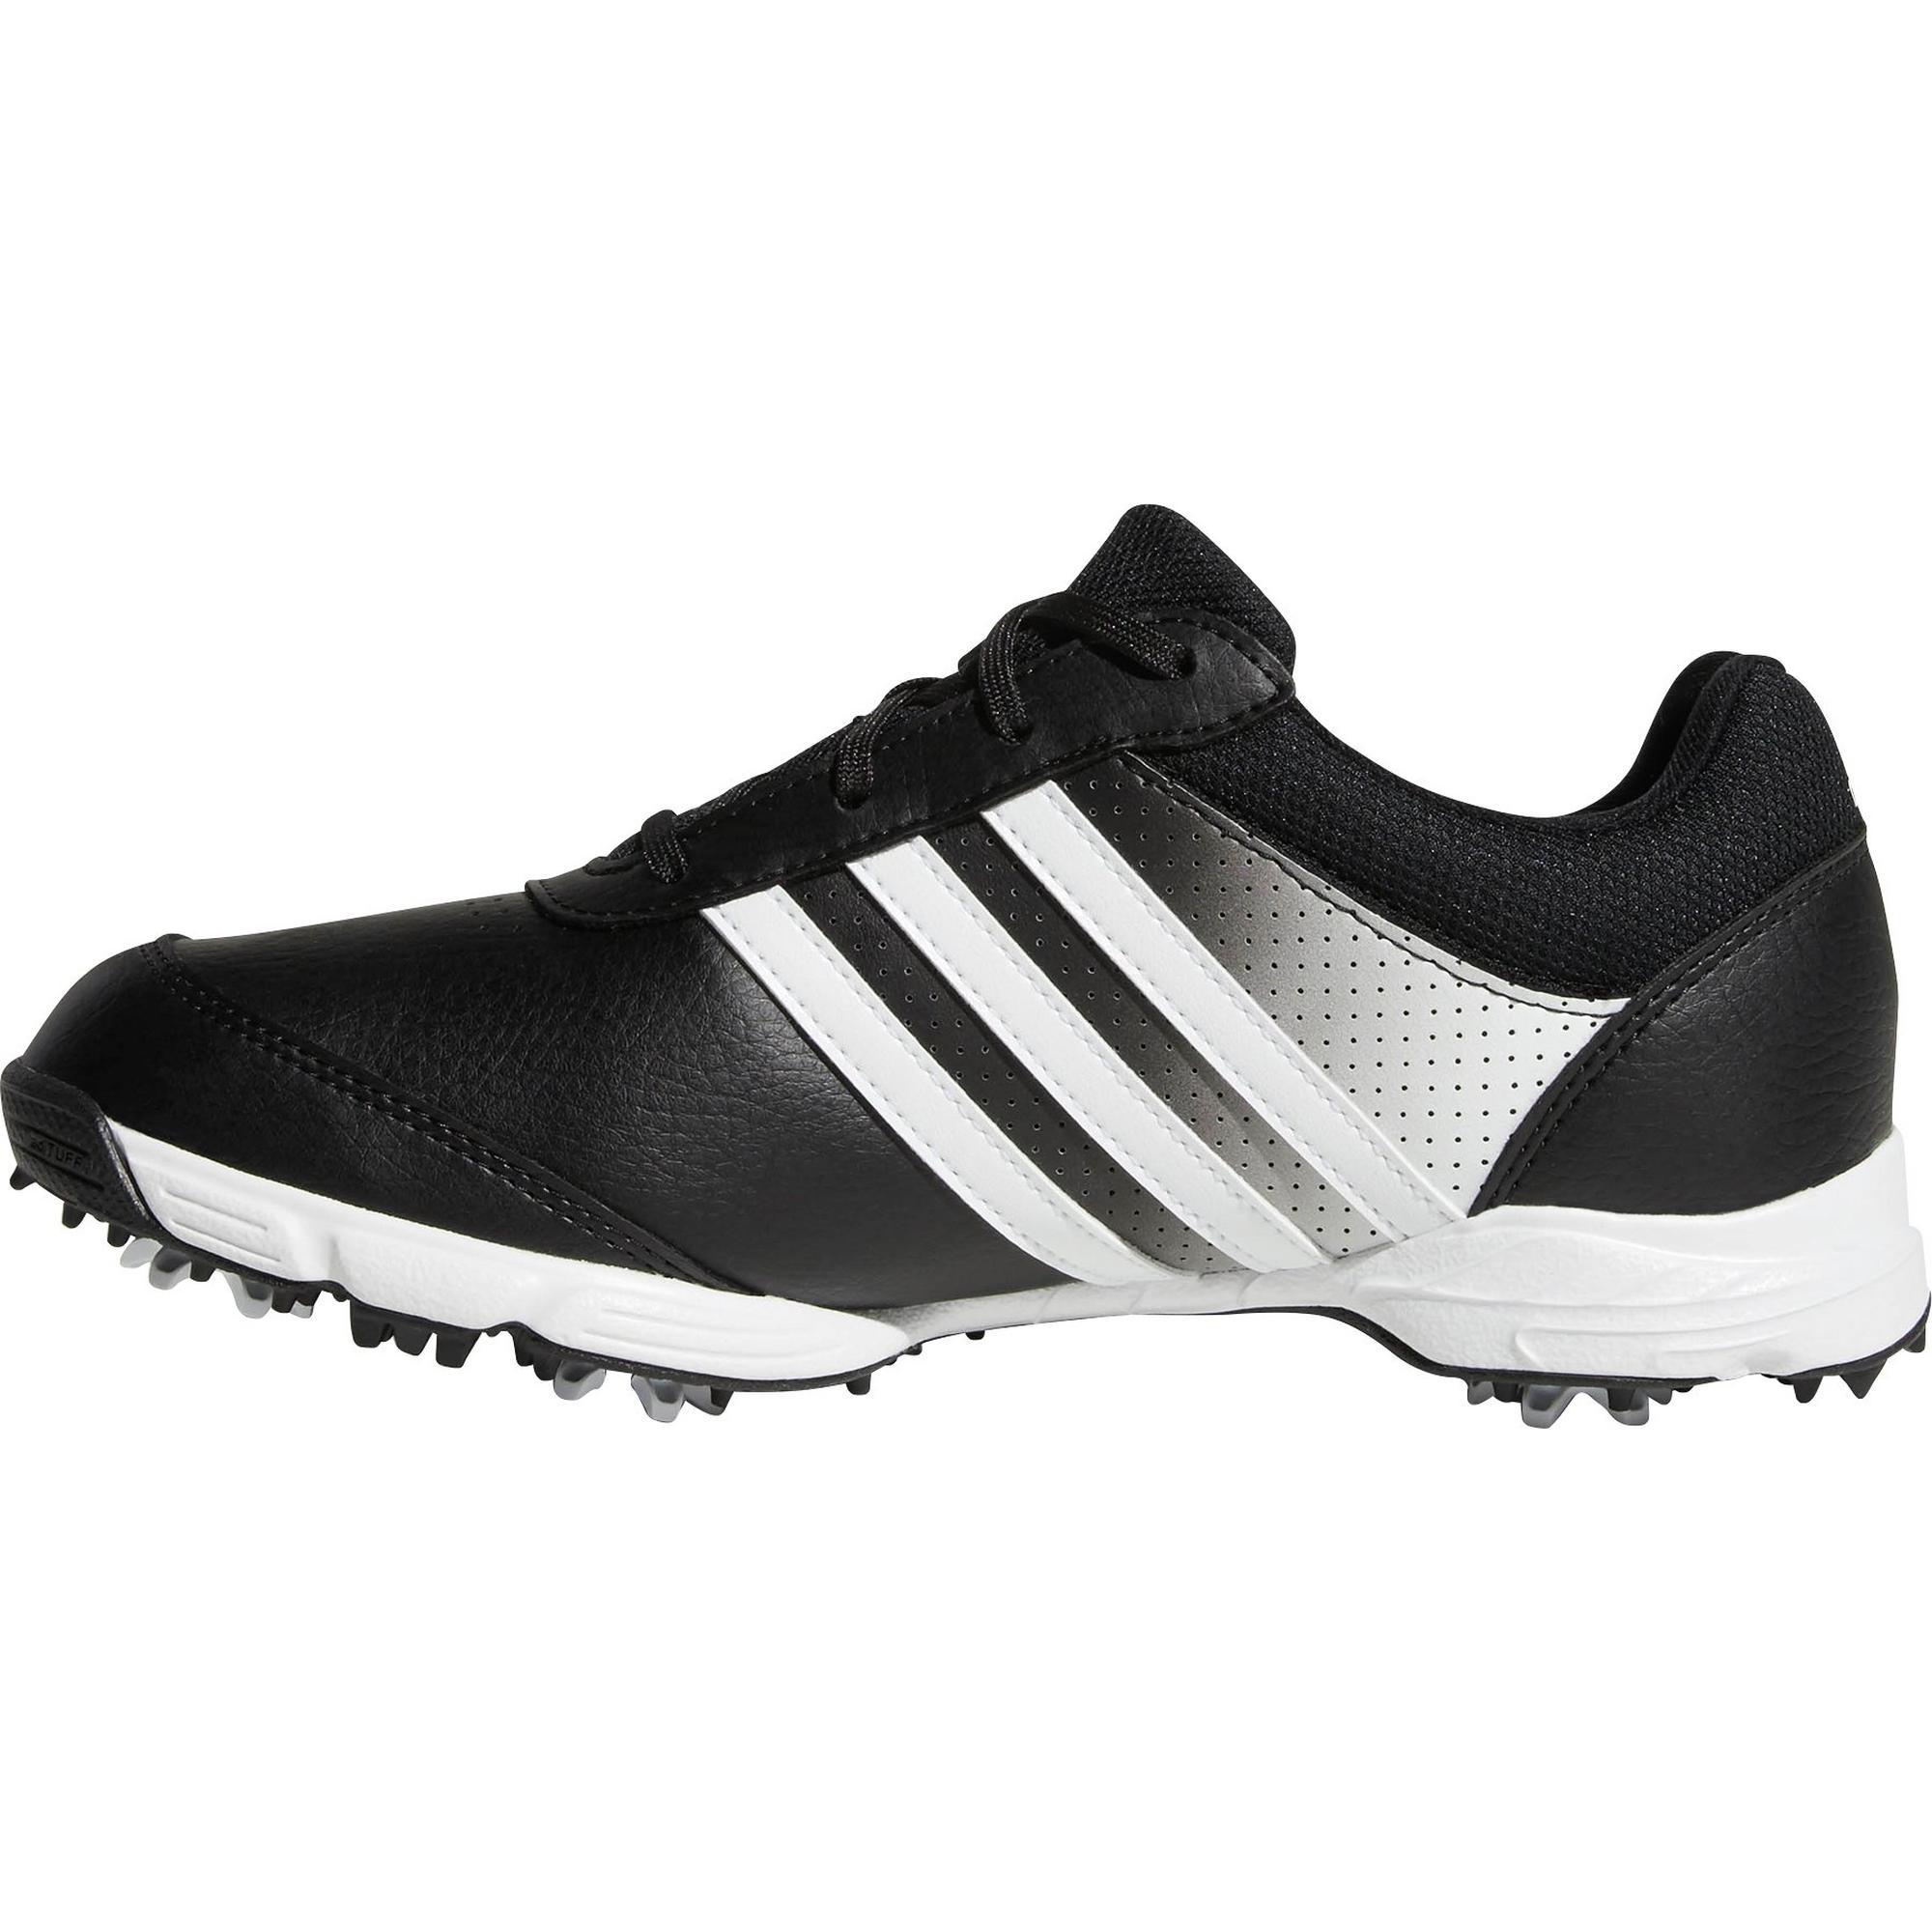 Women's Tech Response Spiked Golf Shoe - Black/White